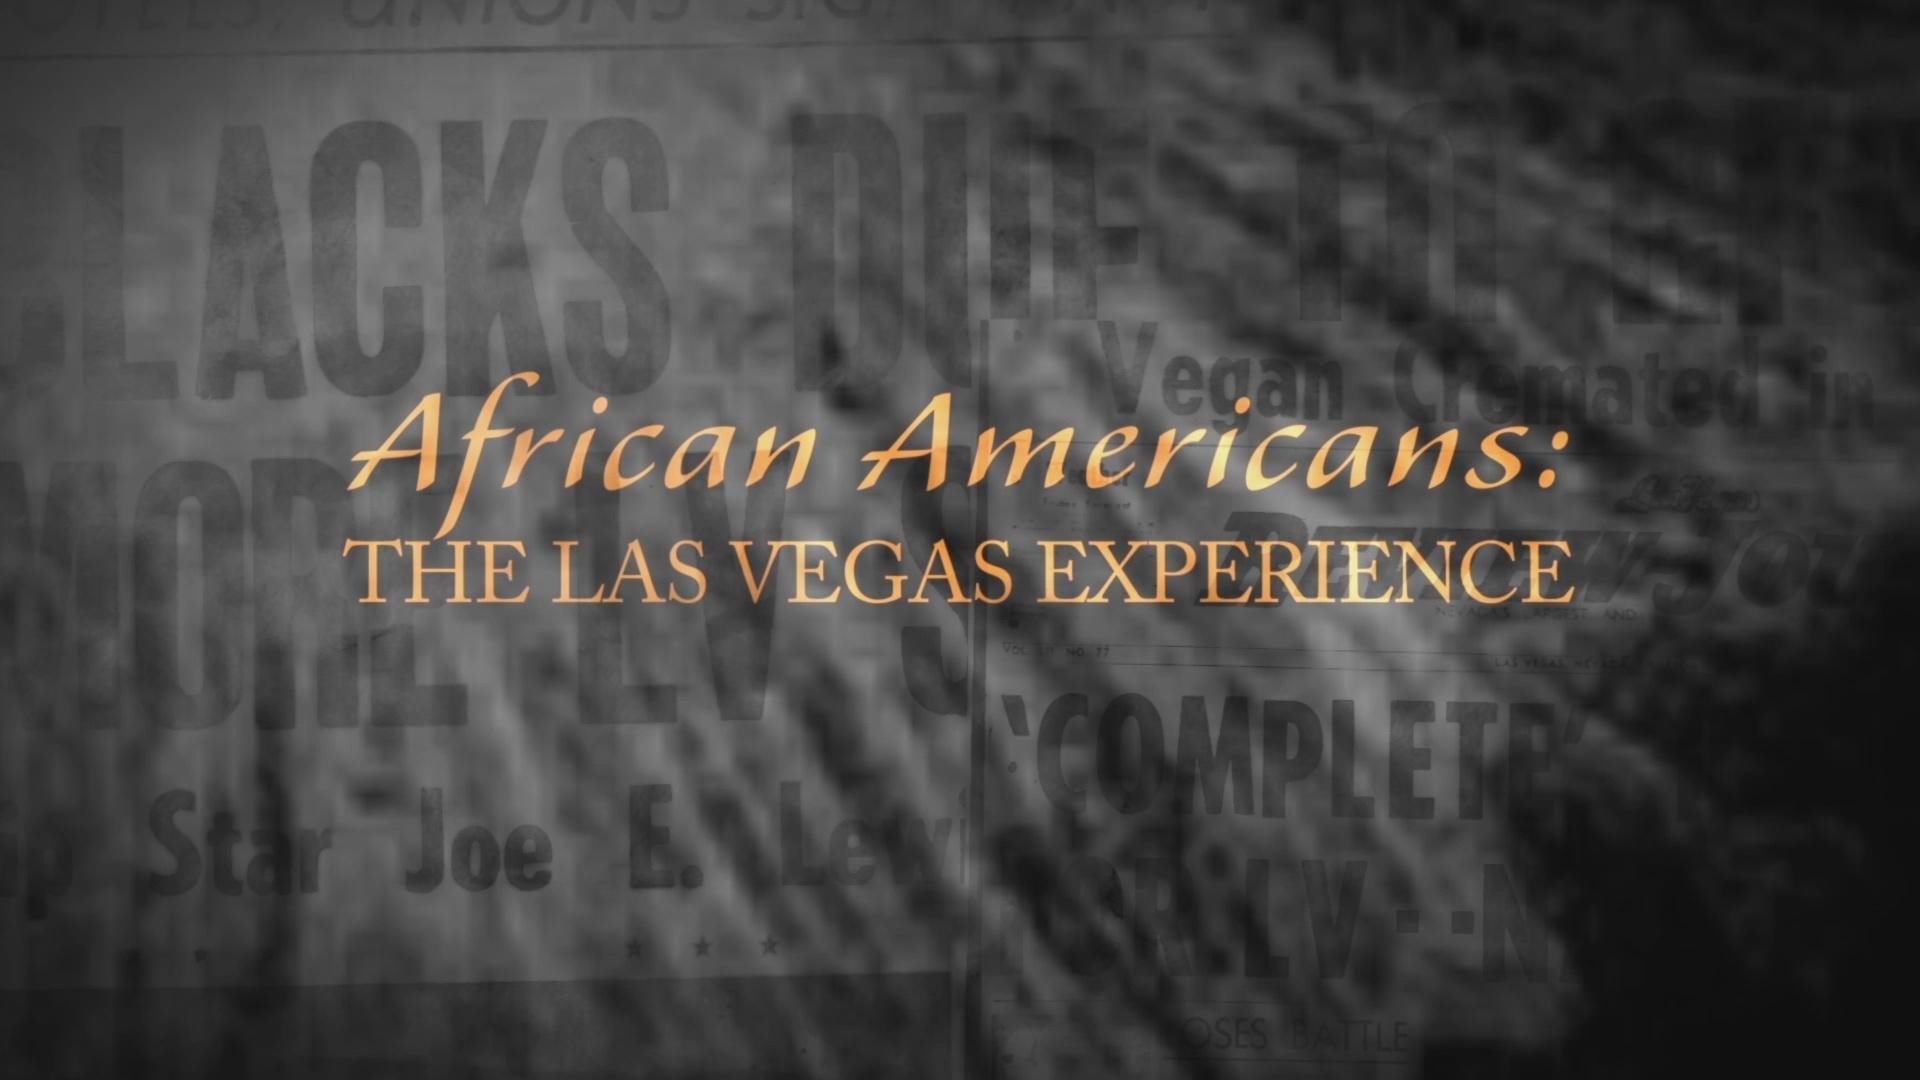 Vegas experience coupons